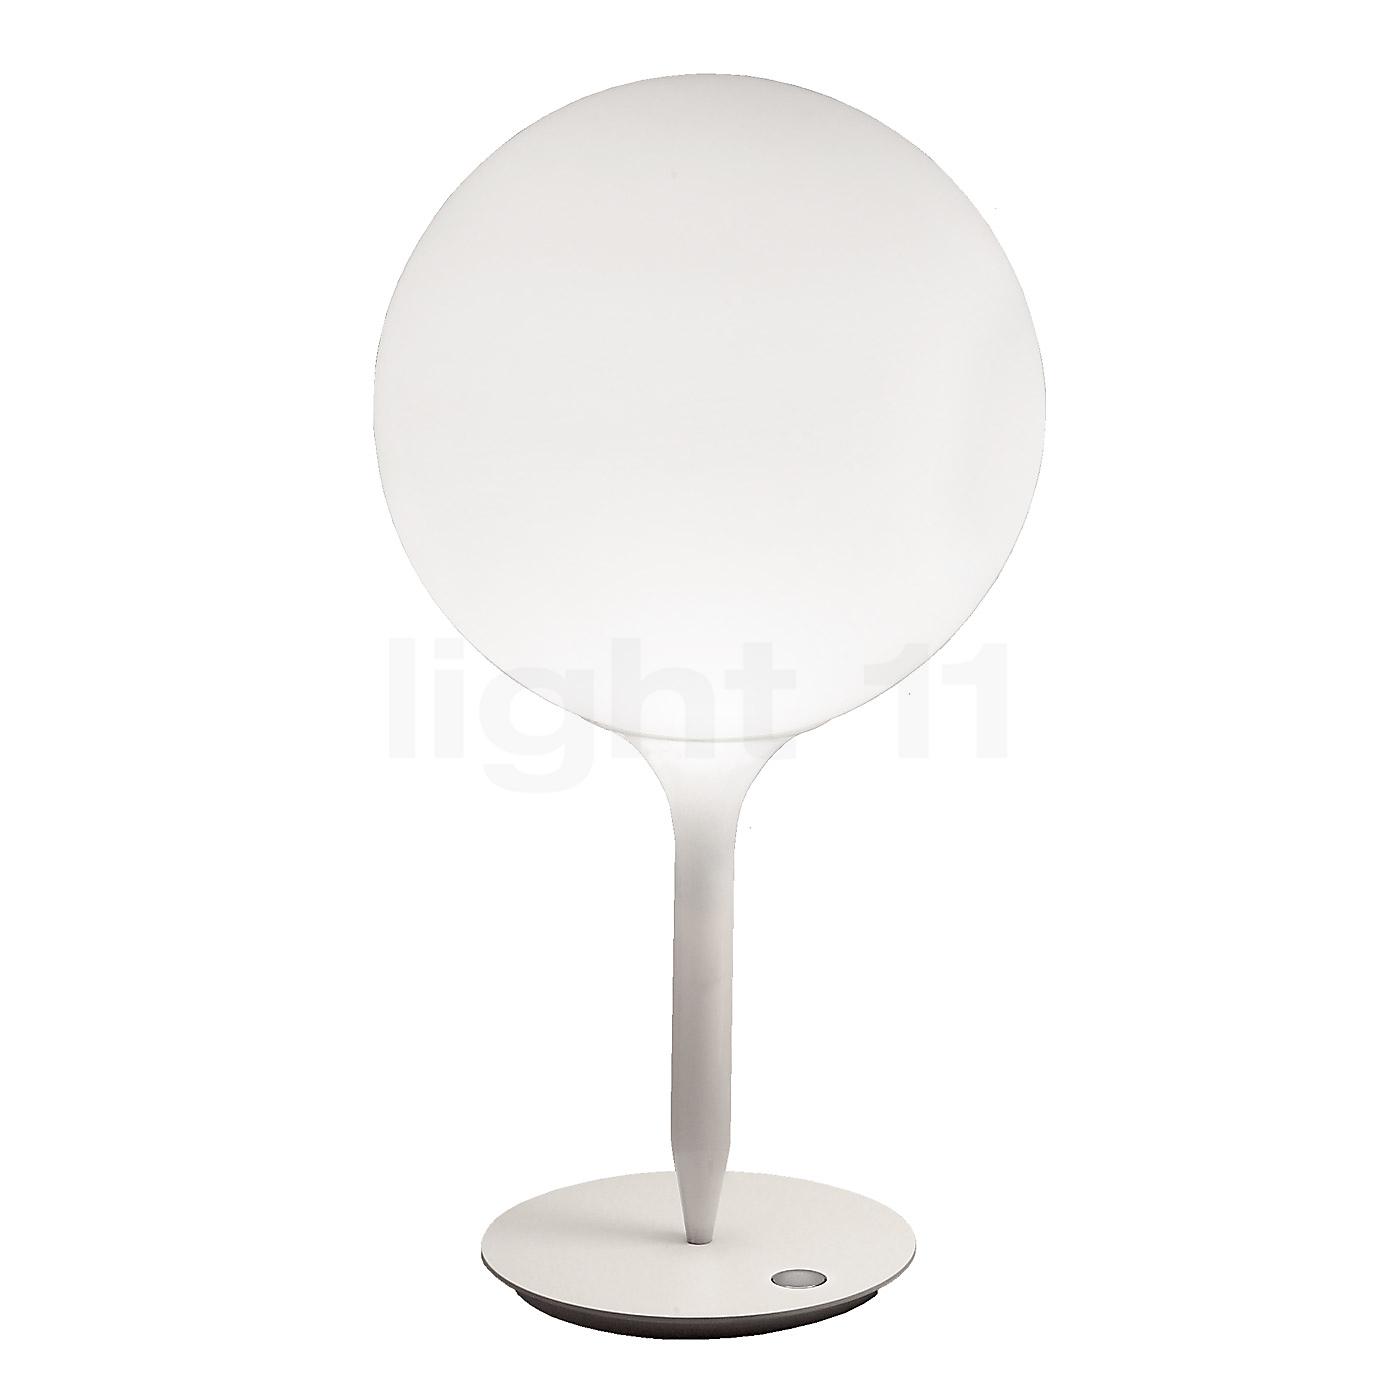 Artemide castore tavolo 35 da comprare su - Artemide lampade tavolo ...